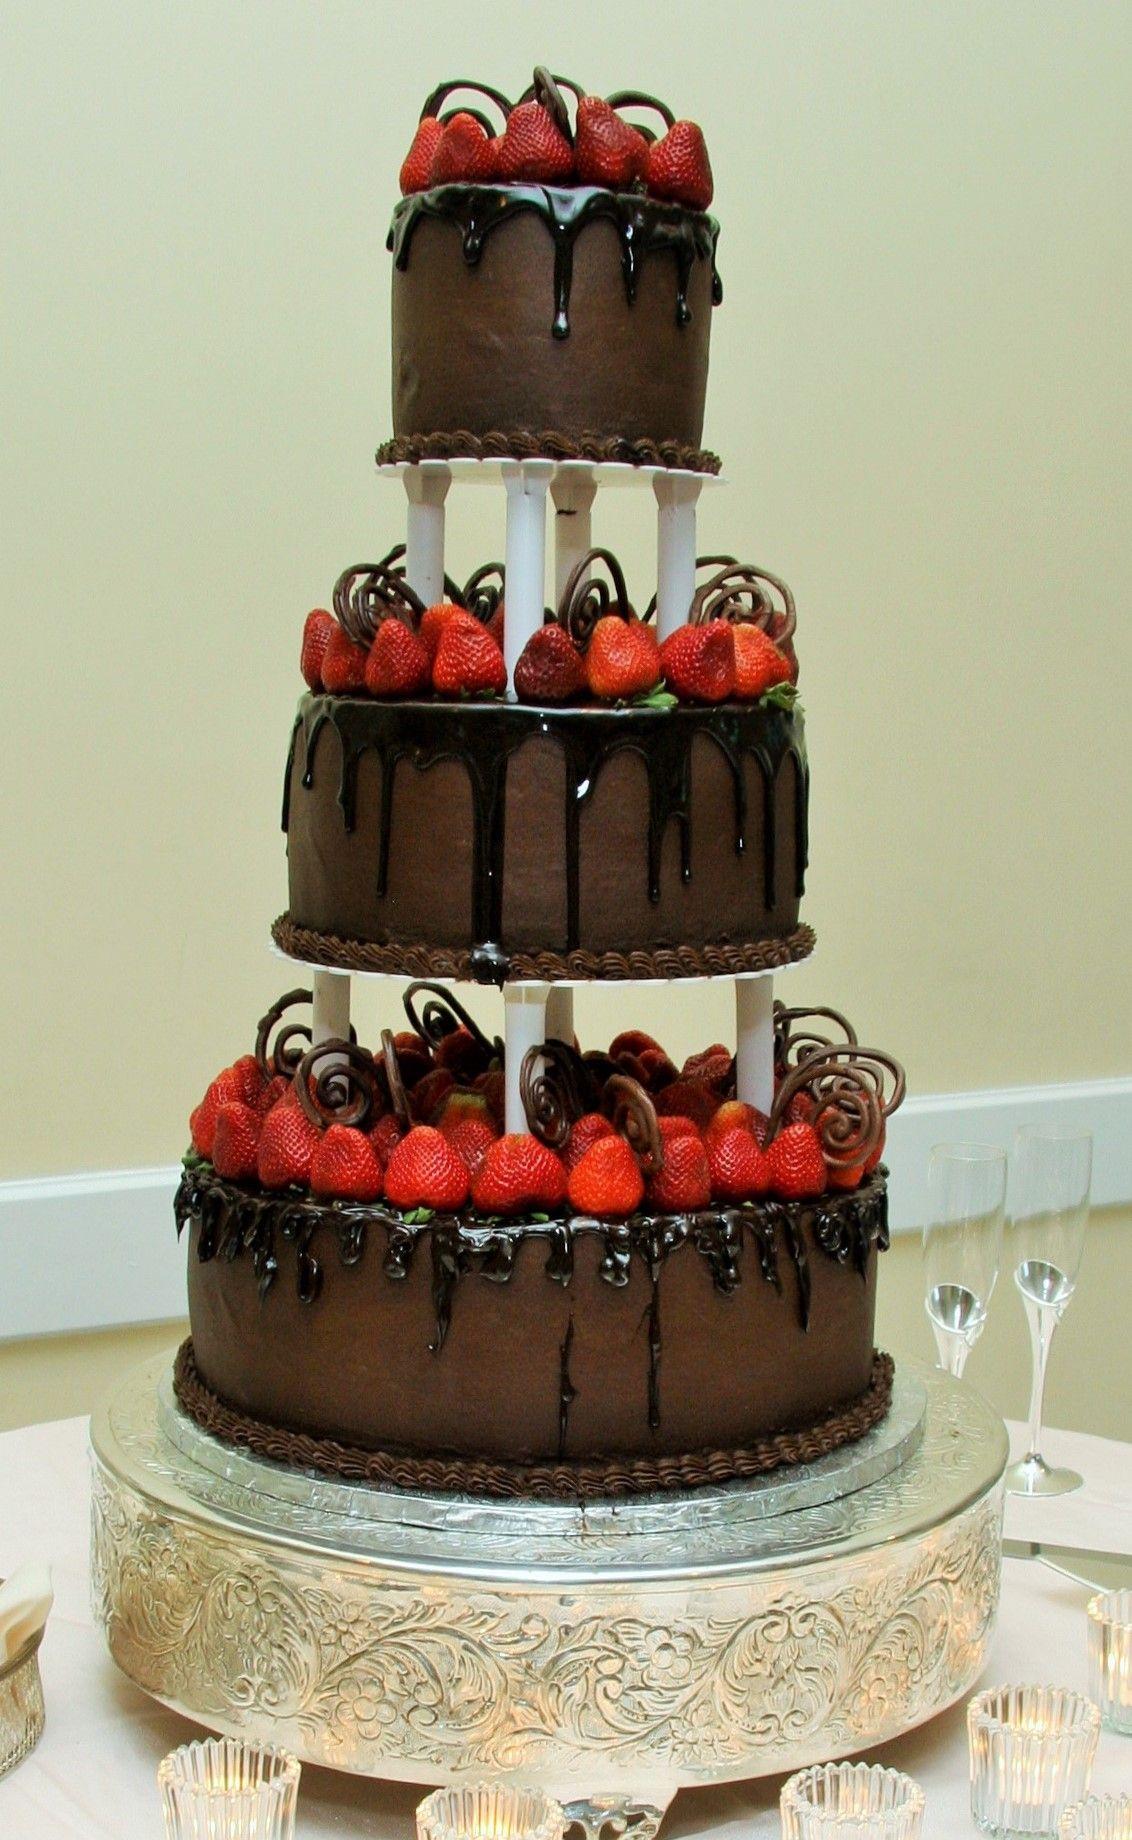 strawberry krunch cake for sale